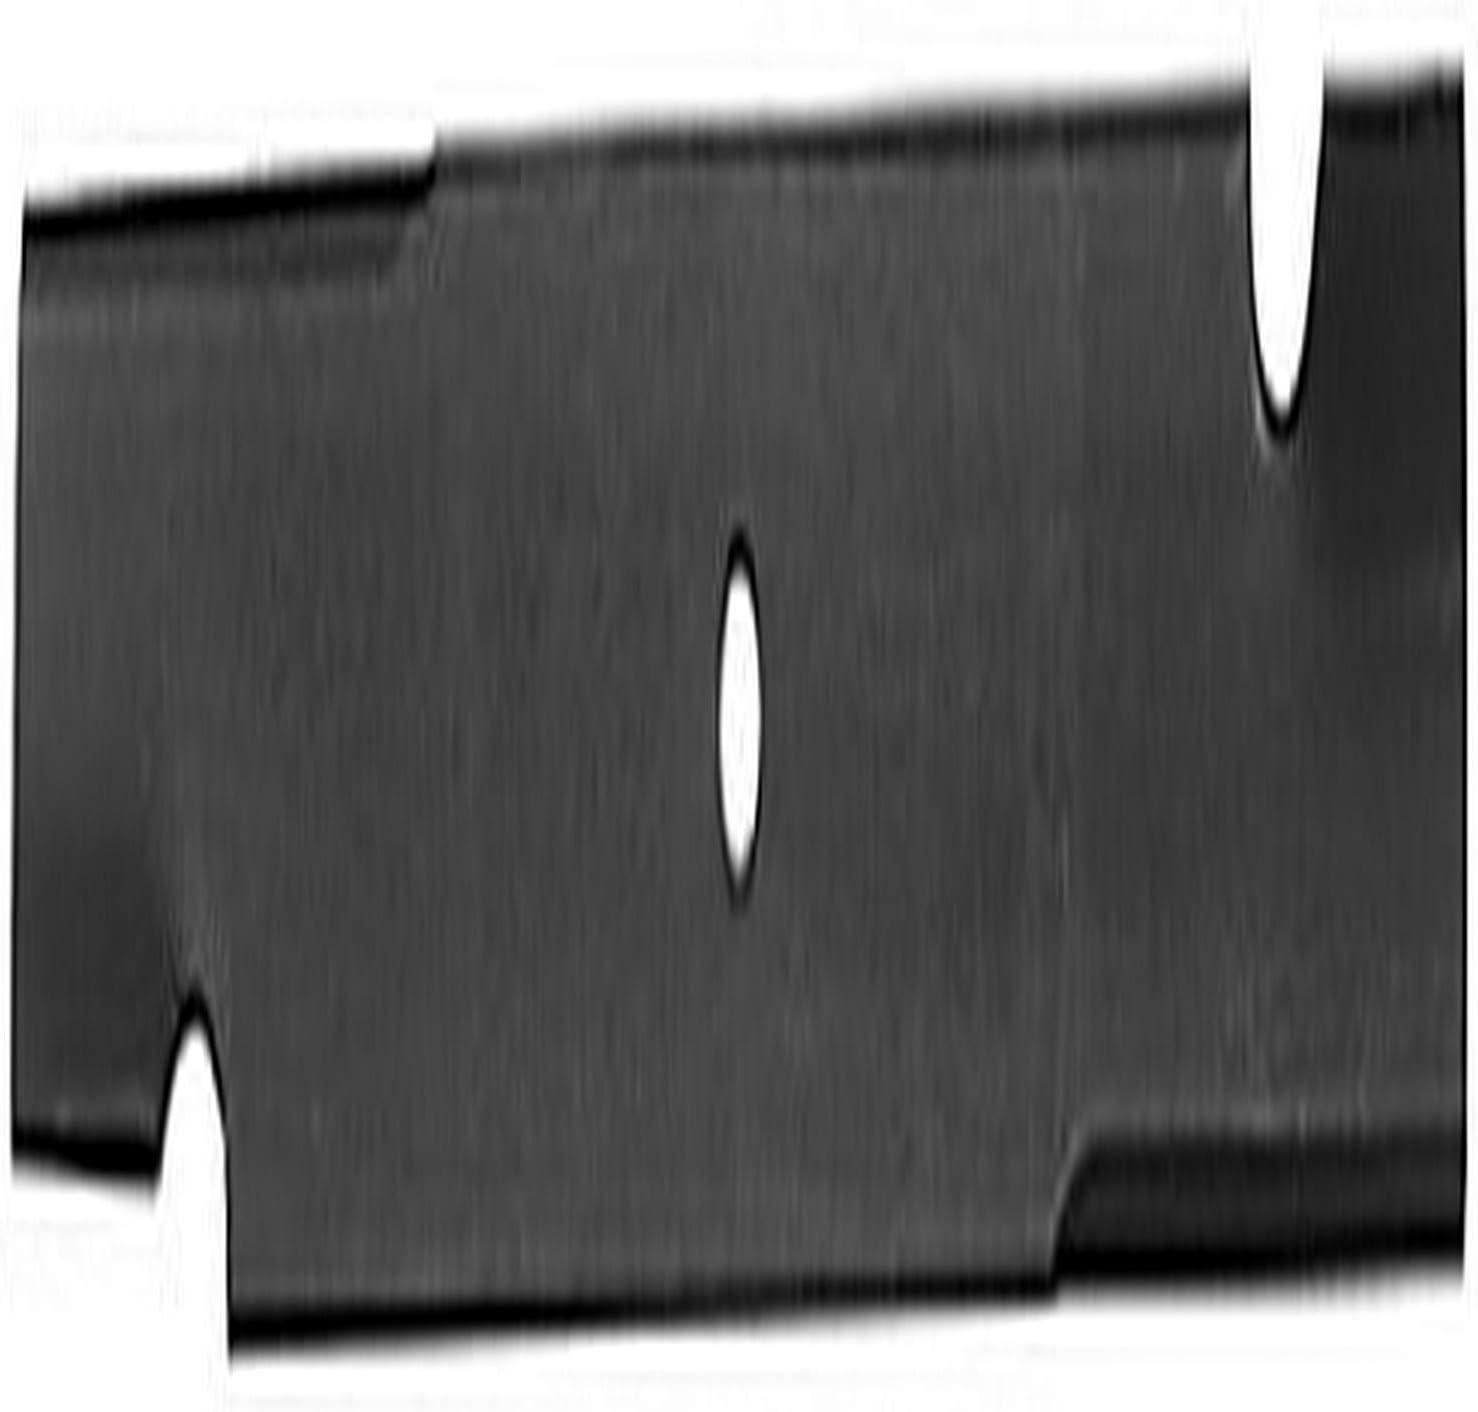 "Oregon 91-627 Xtended 24-1//2/"" Blades 9 Pack Scag 48112 482788 Sabretooth Mowers"